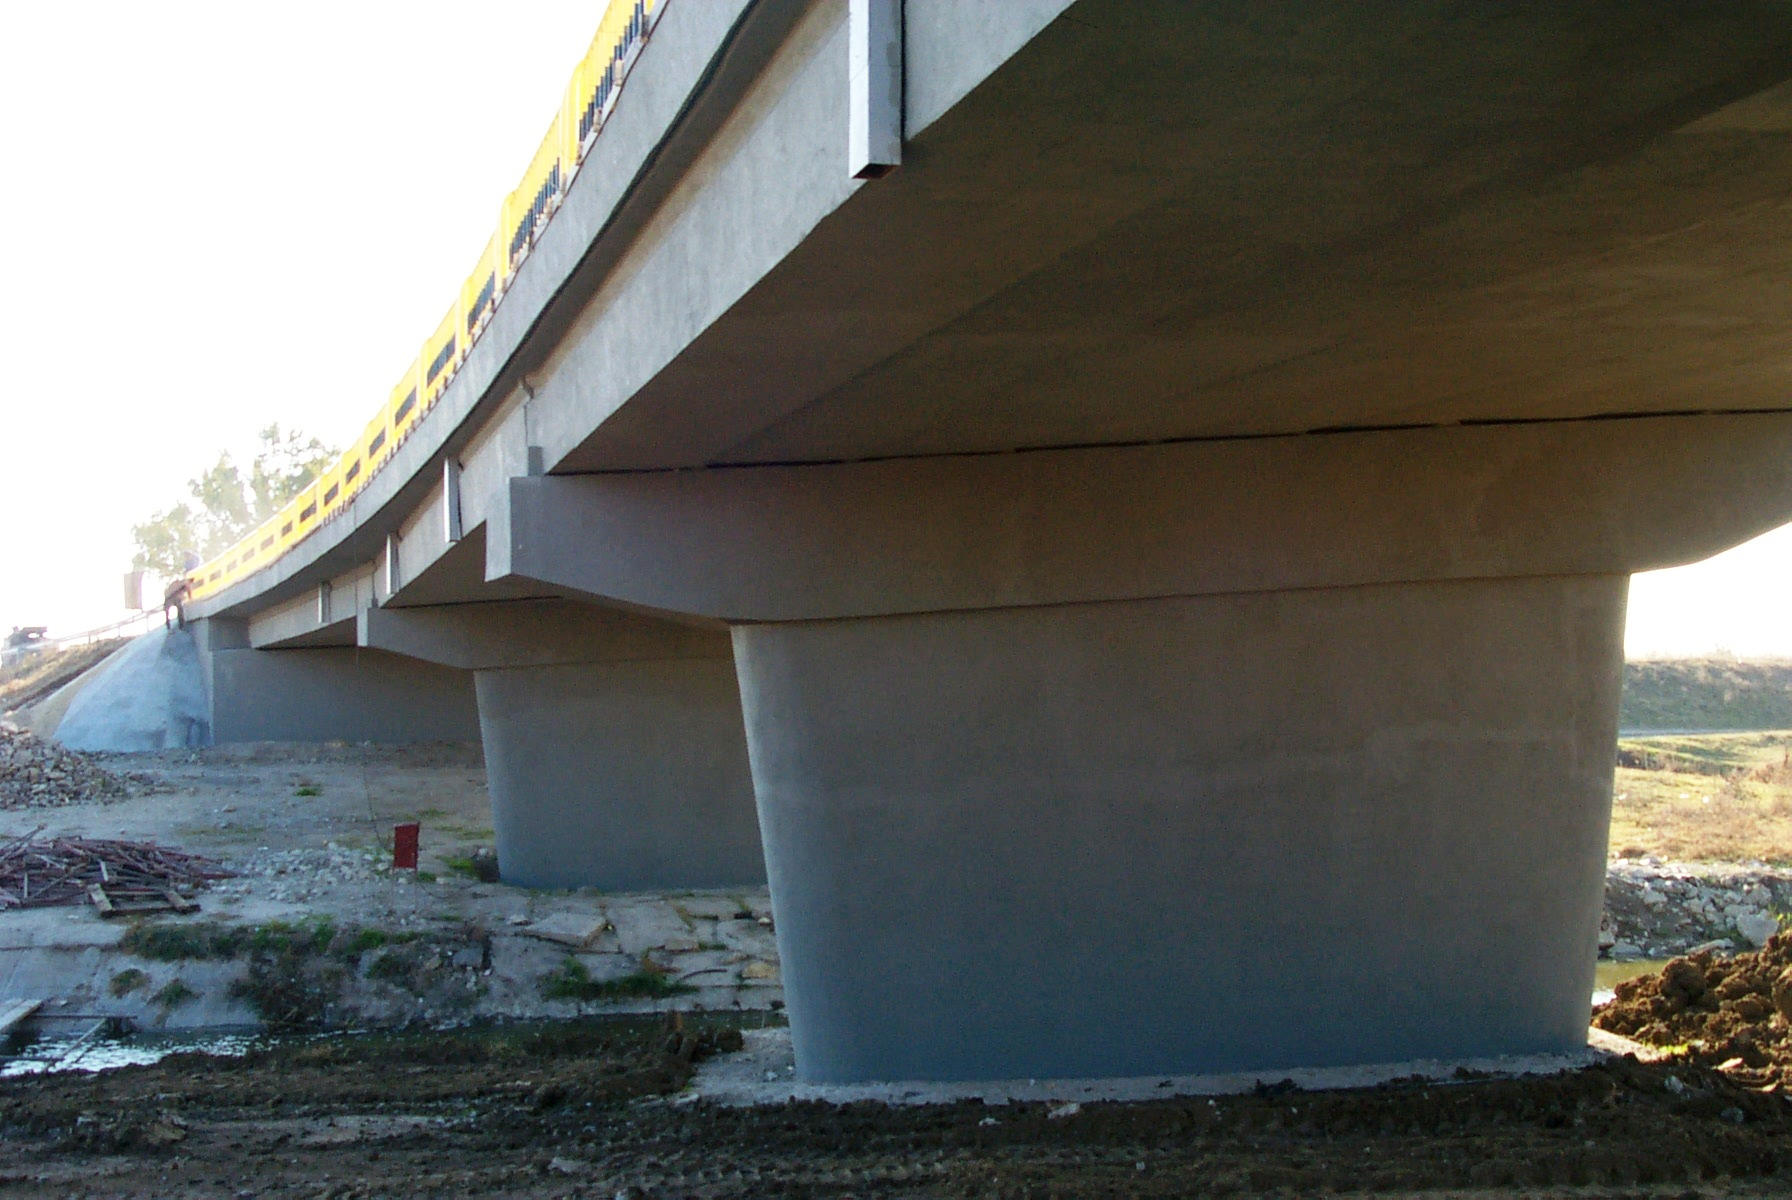 Reparatii pod (DN2), Km. 33 - 028, peste raul Calnistea MAPEI - Poza 24